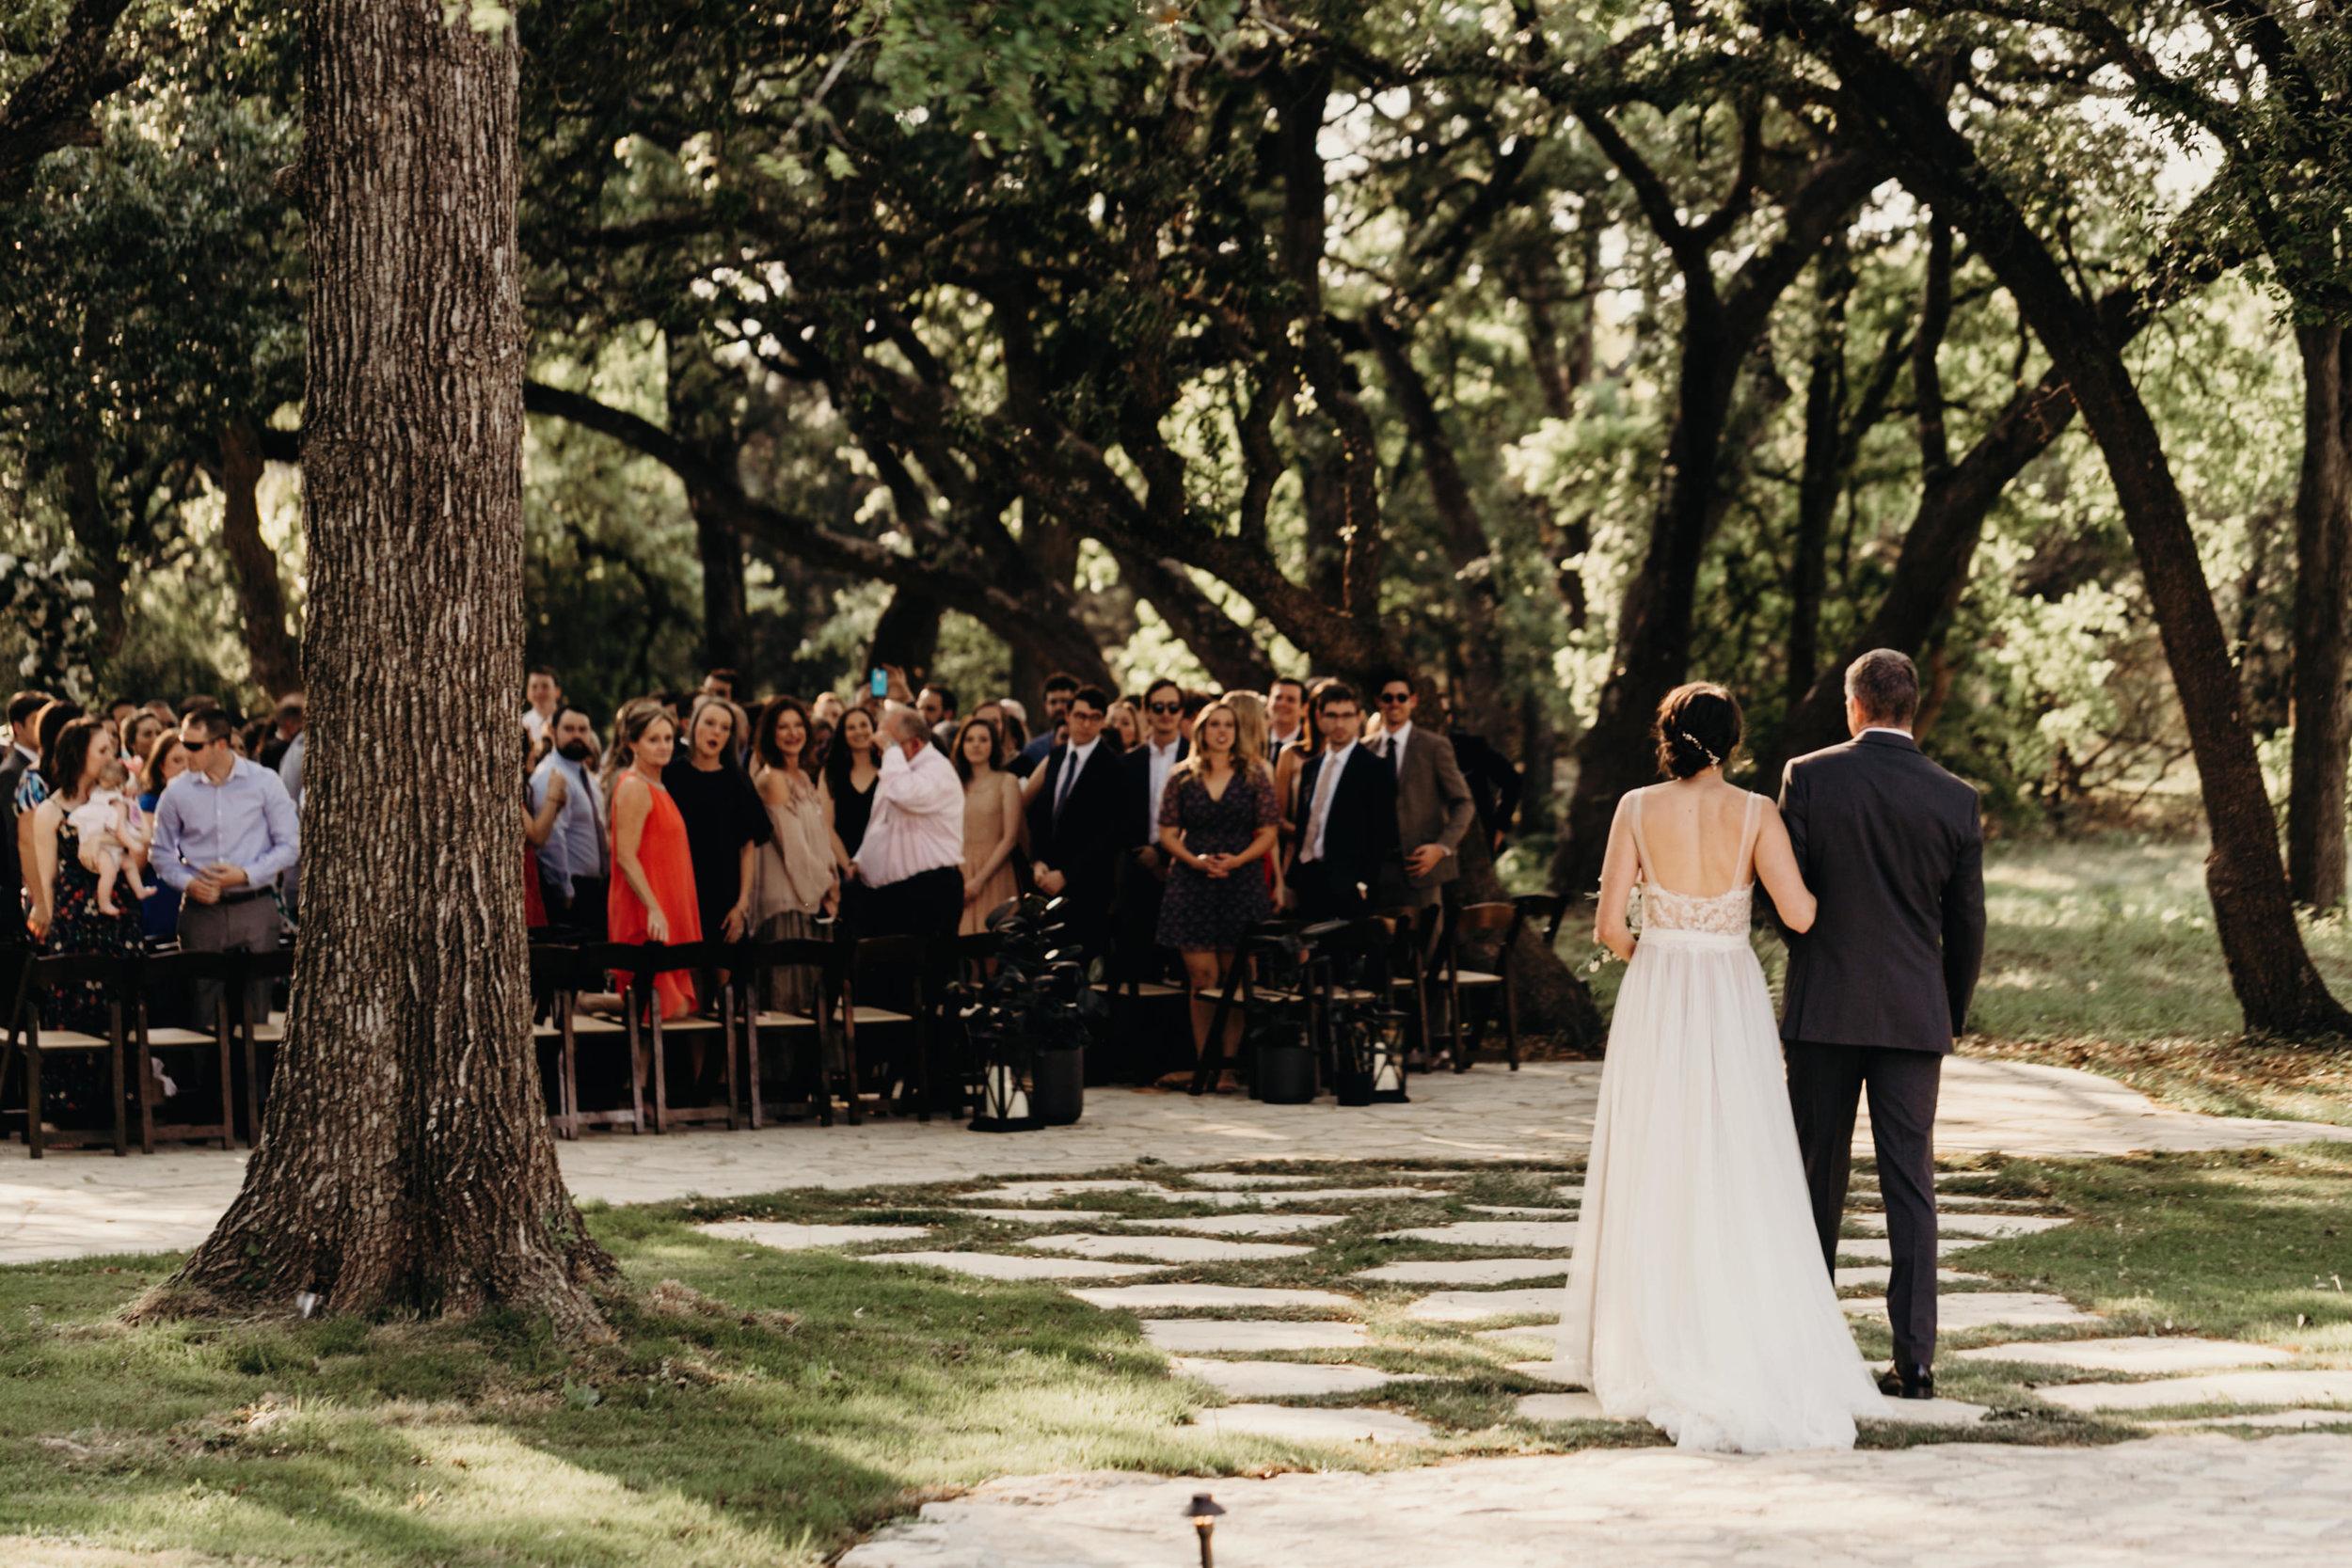 austin-wedding-lindsey-bryce-320.jpg